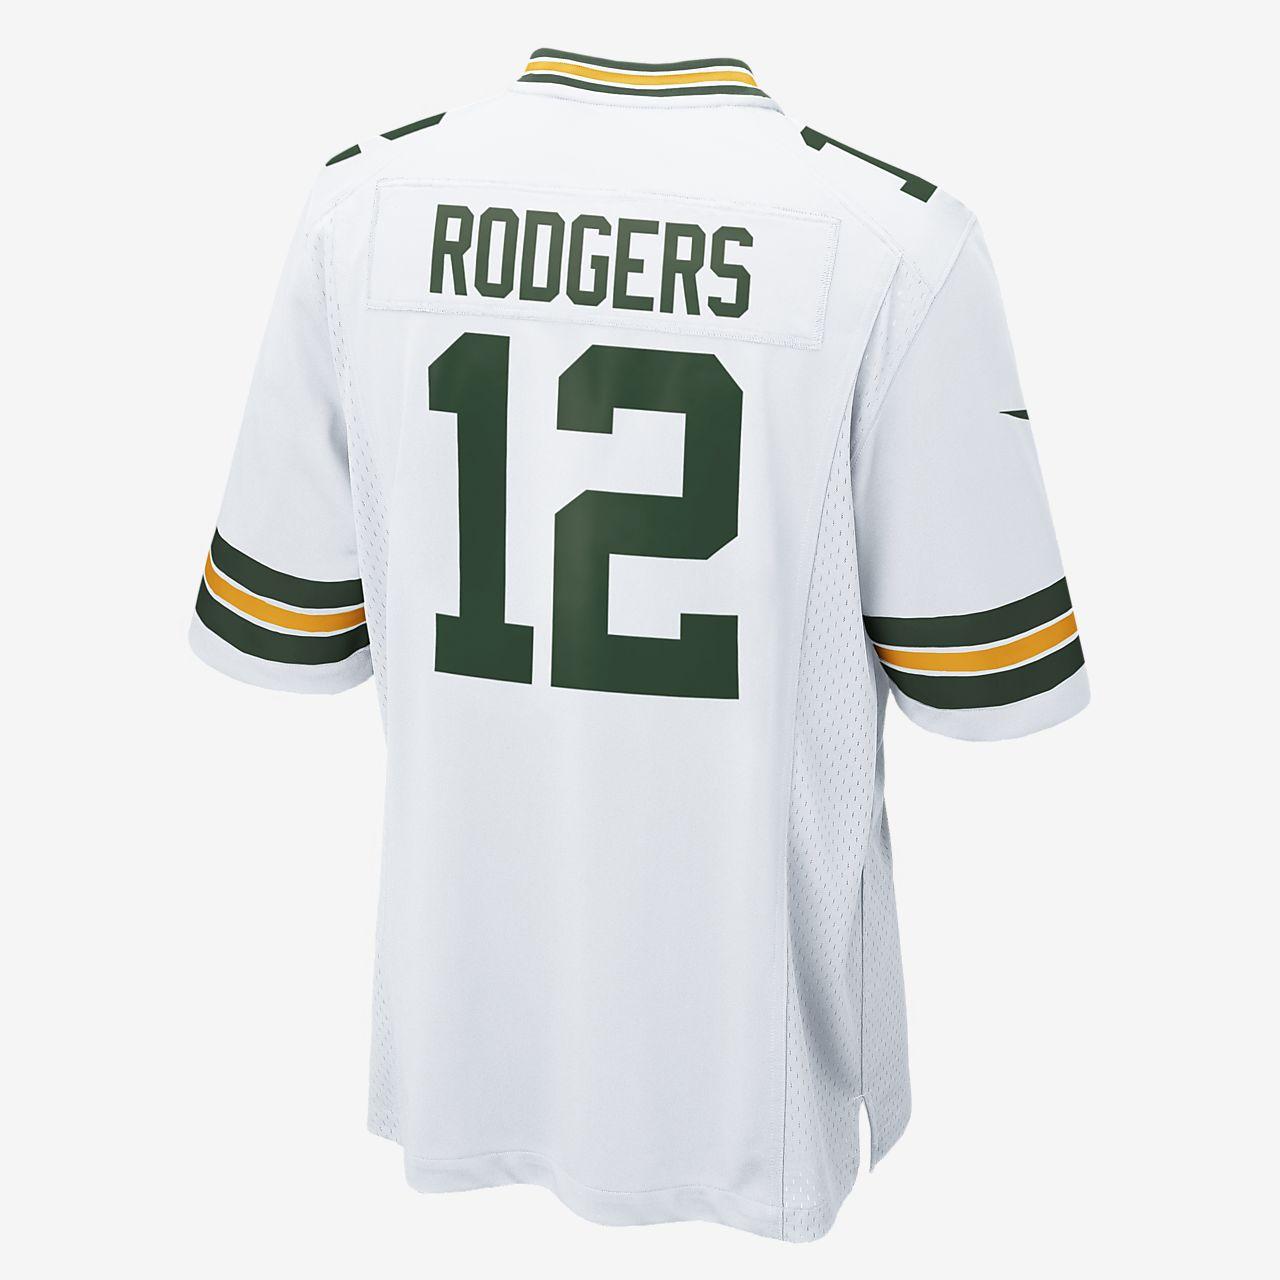 0f54e9e12 ... Camisola alternativa de jogo de futebol americano NFL Green Bay Packers  (Aaron Rodgers) para